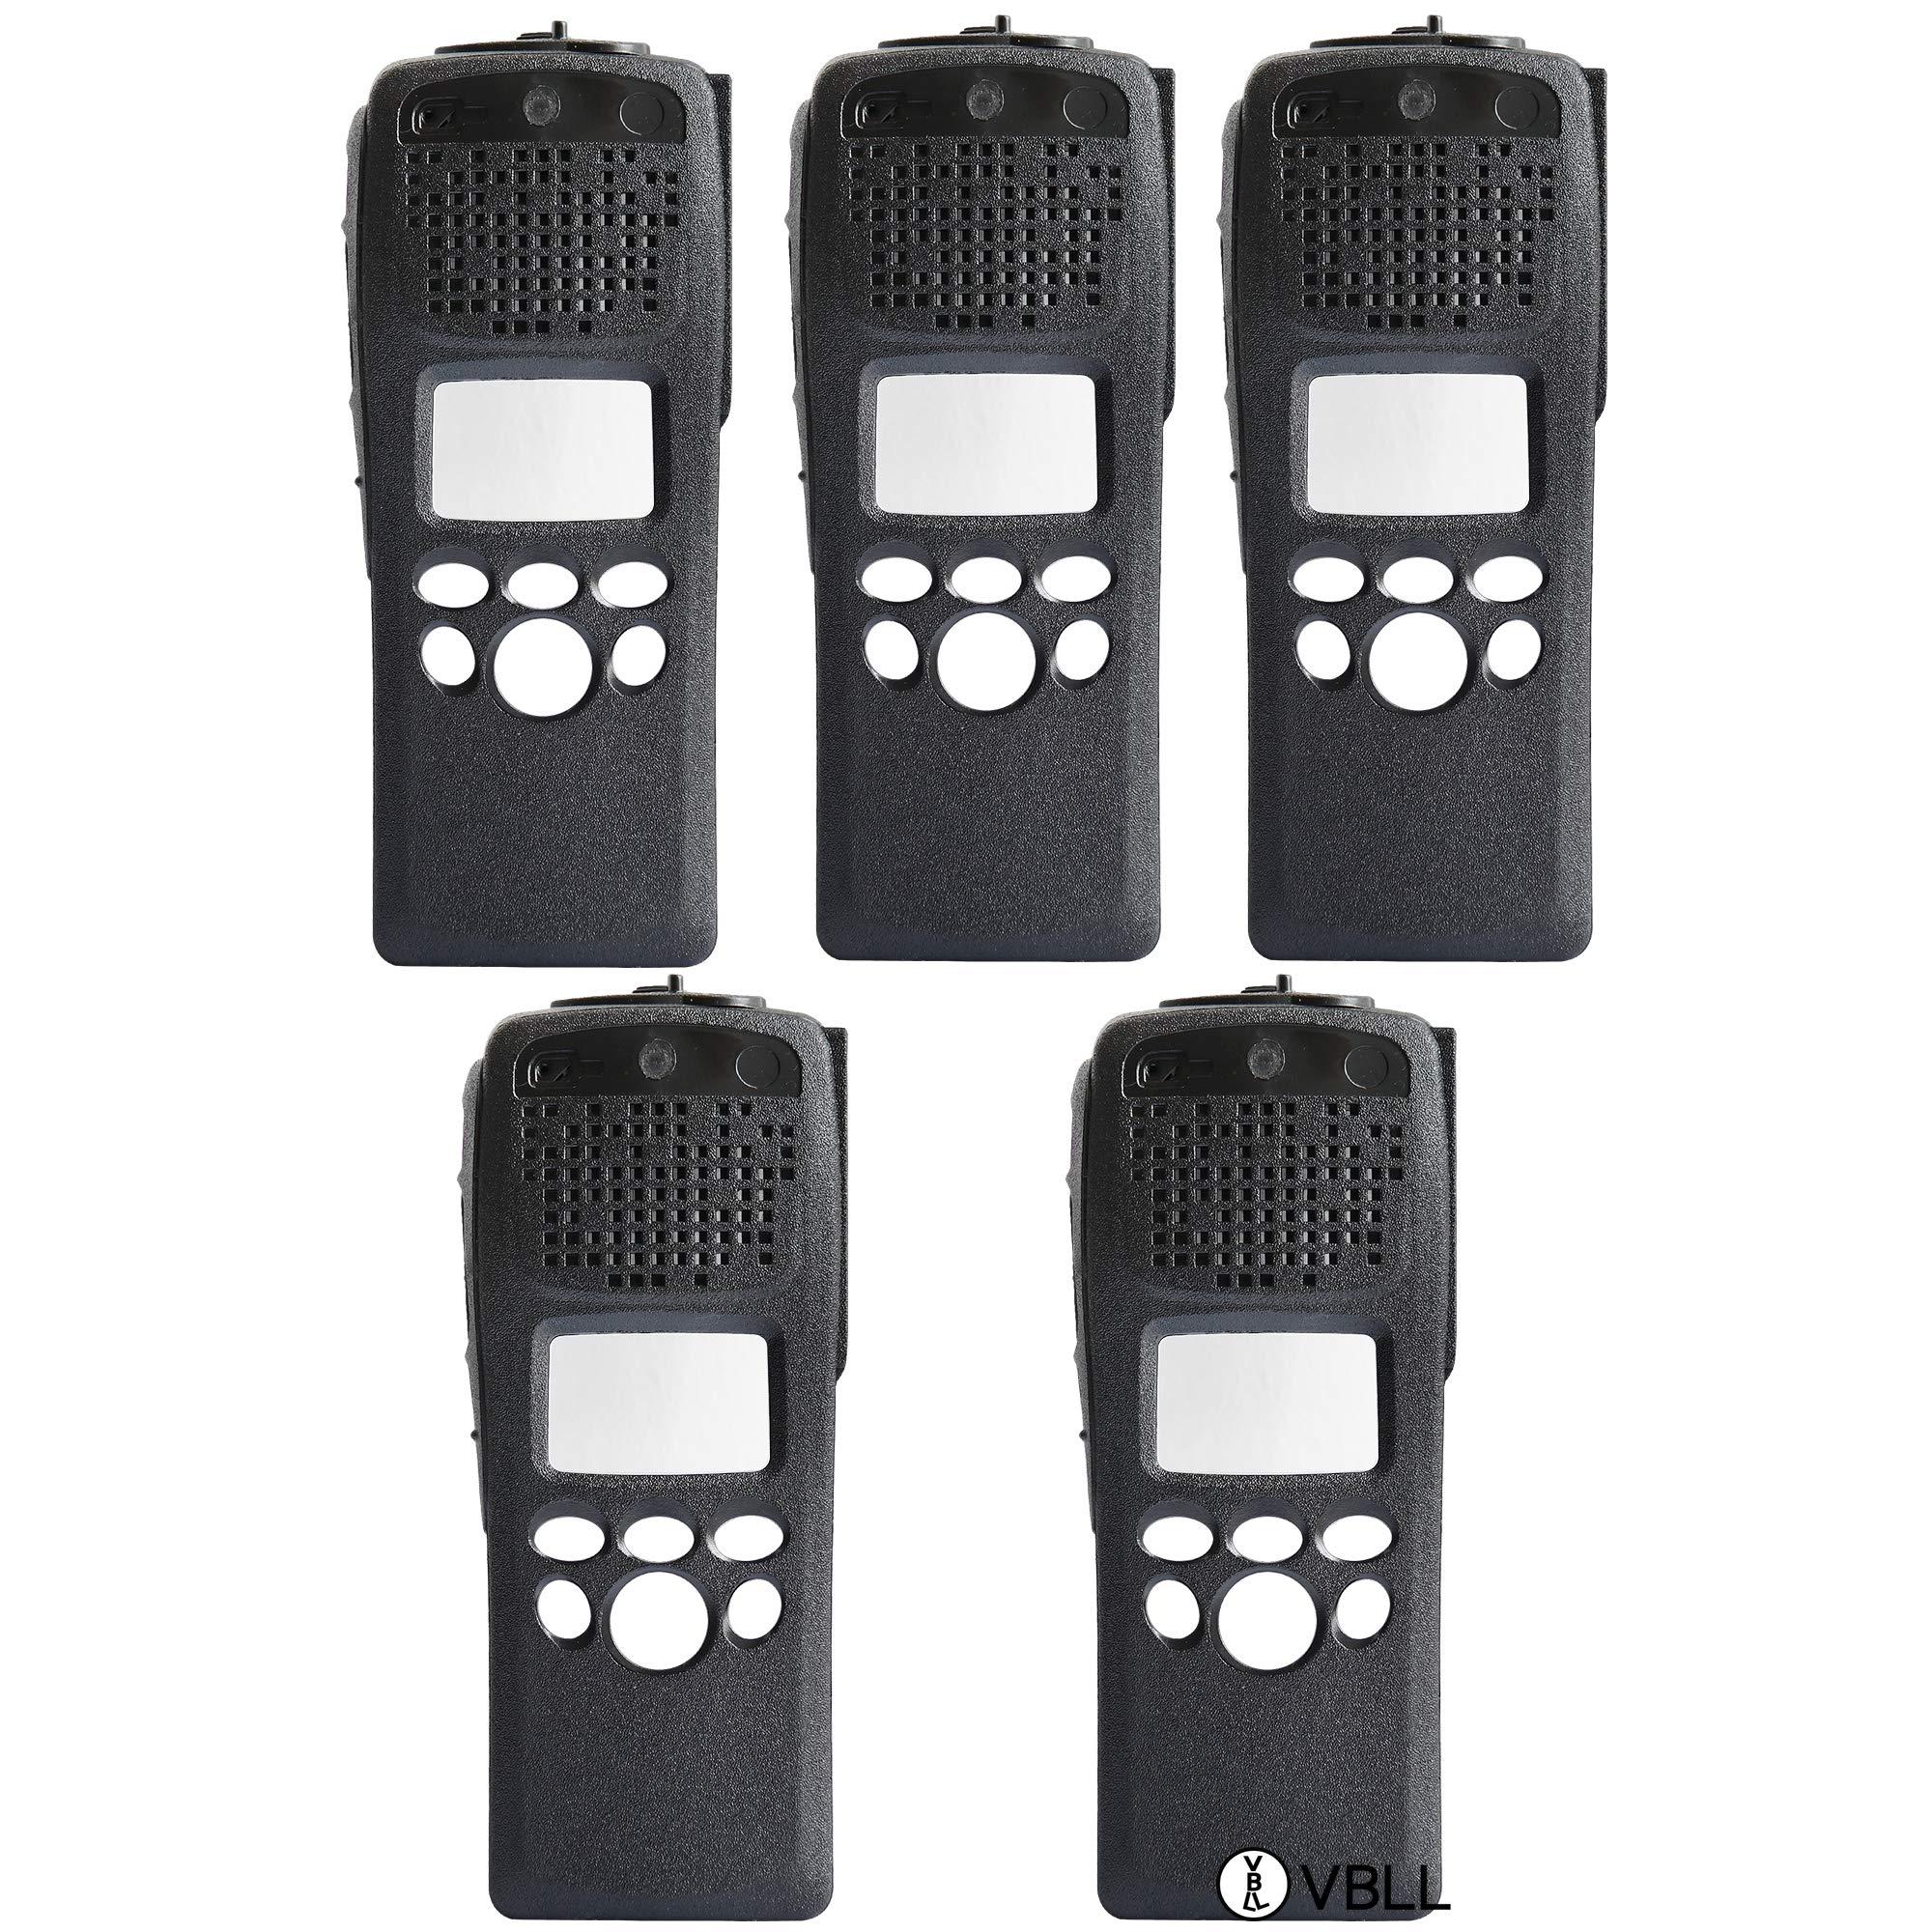 BLVL 5X PMLN4792 Black Replacement Repair Case Housing for Motorola Astro XTS2500 Model 2 Radio